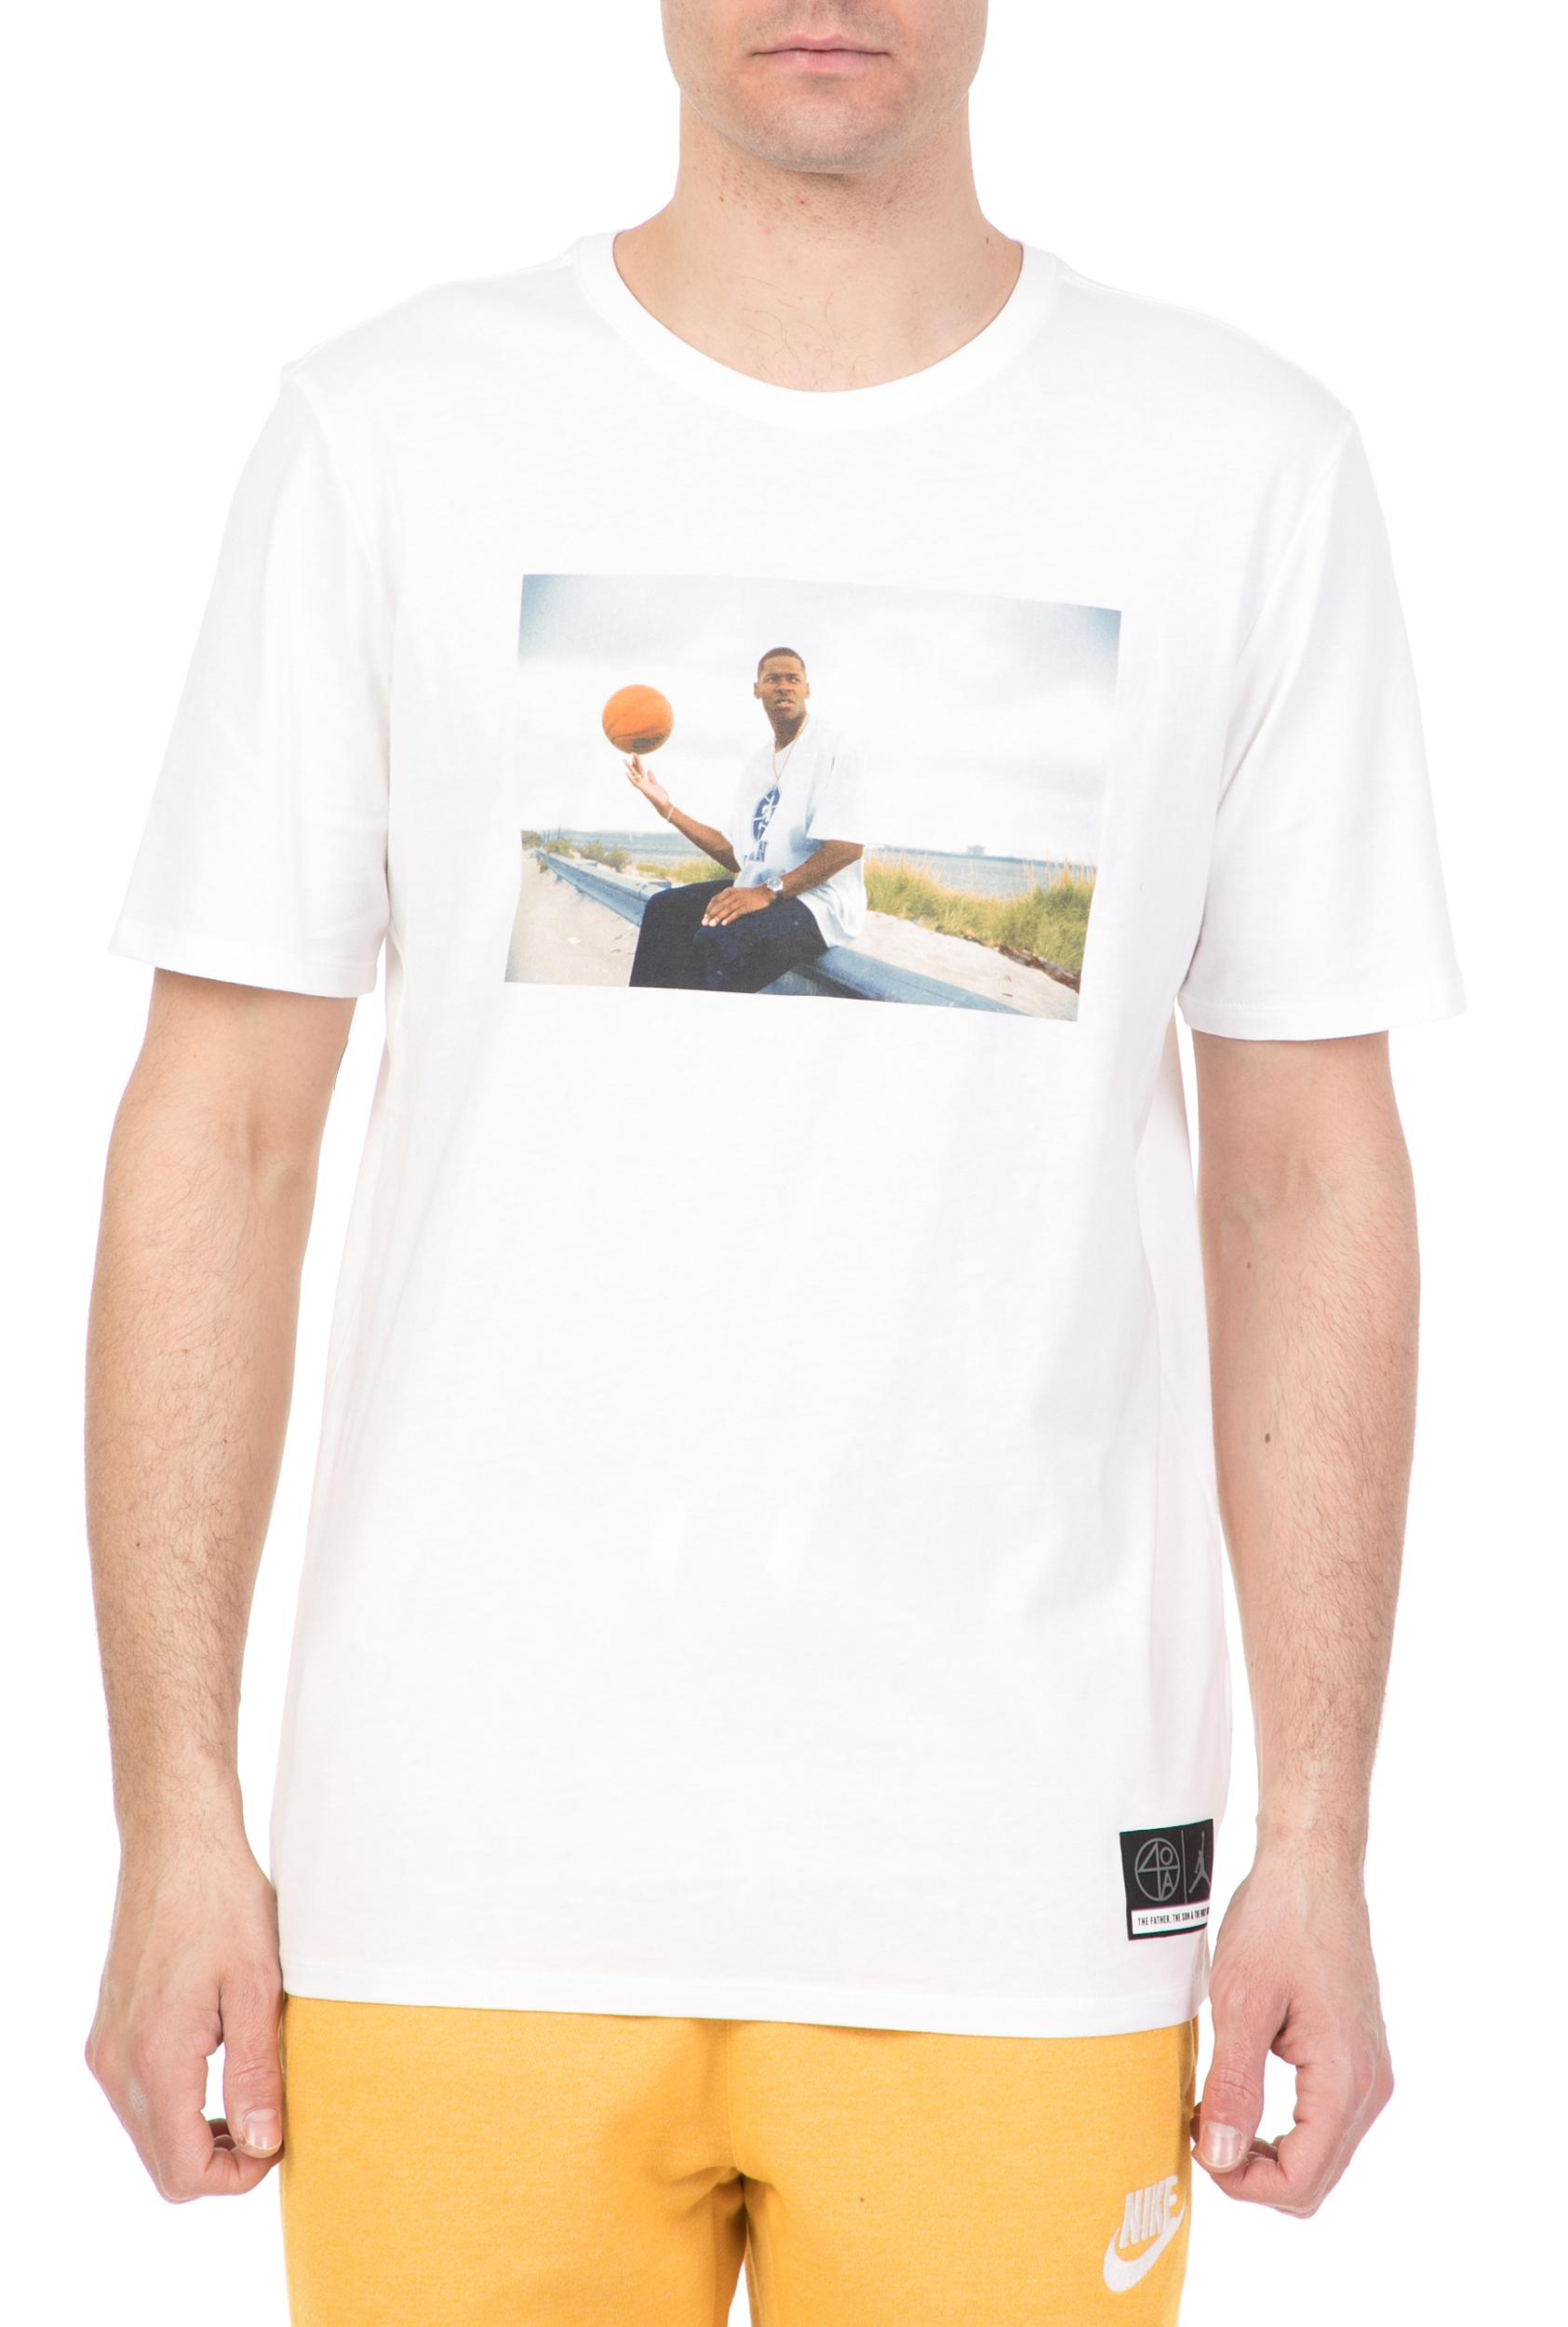 5ed936192ec8 NIKE - Ανδρικό t-shirt Jordan Sportswear  He Got Game  NIKE λευκό